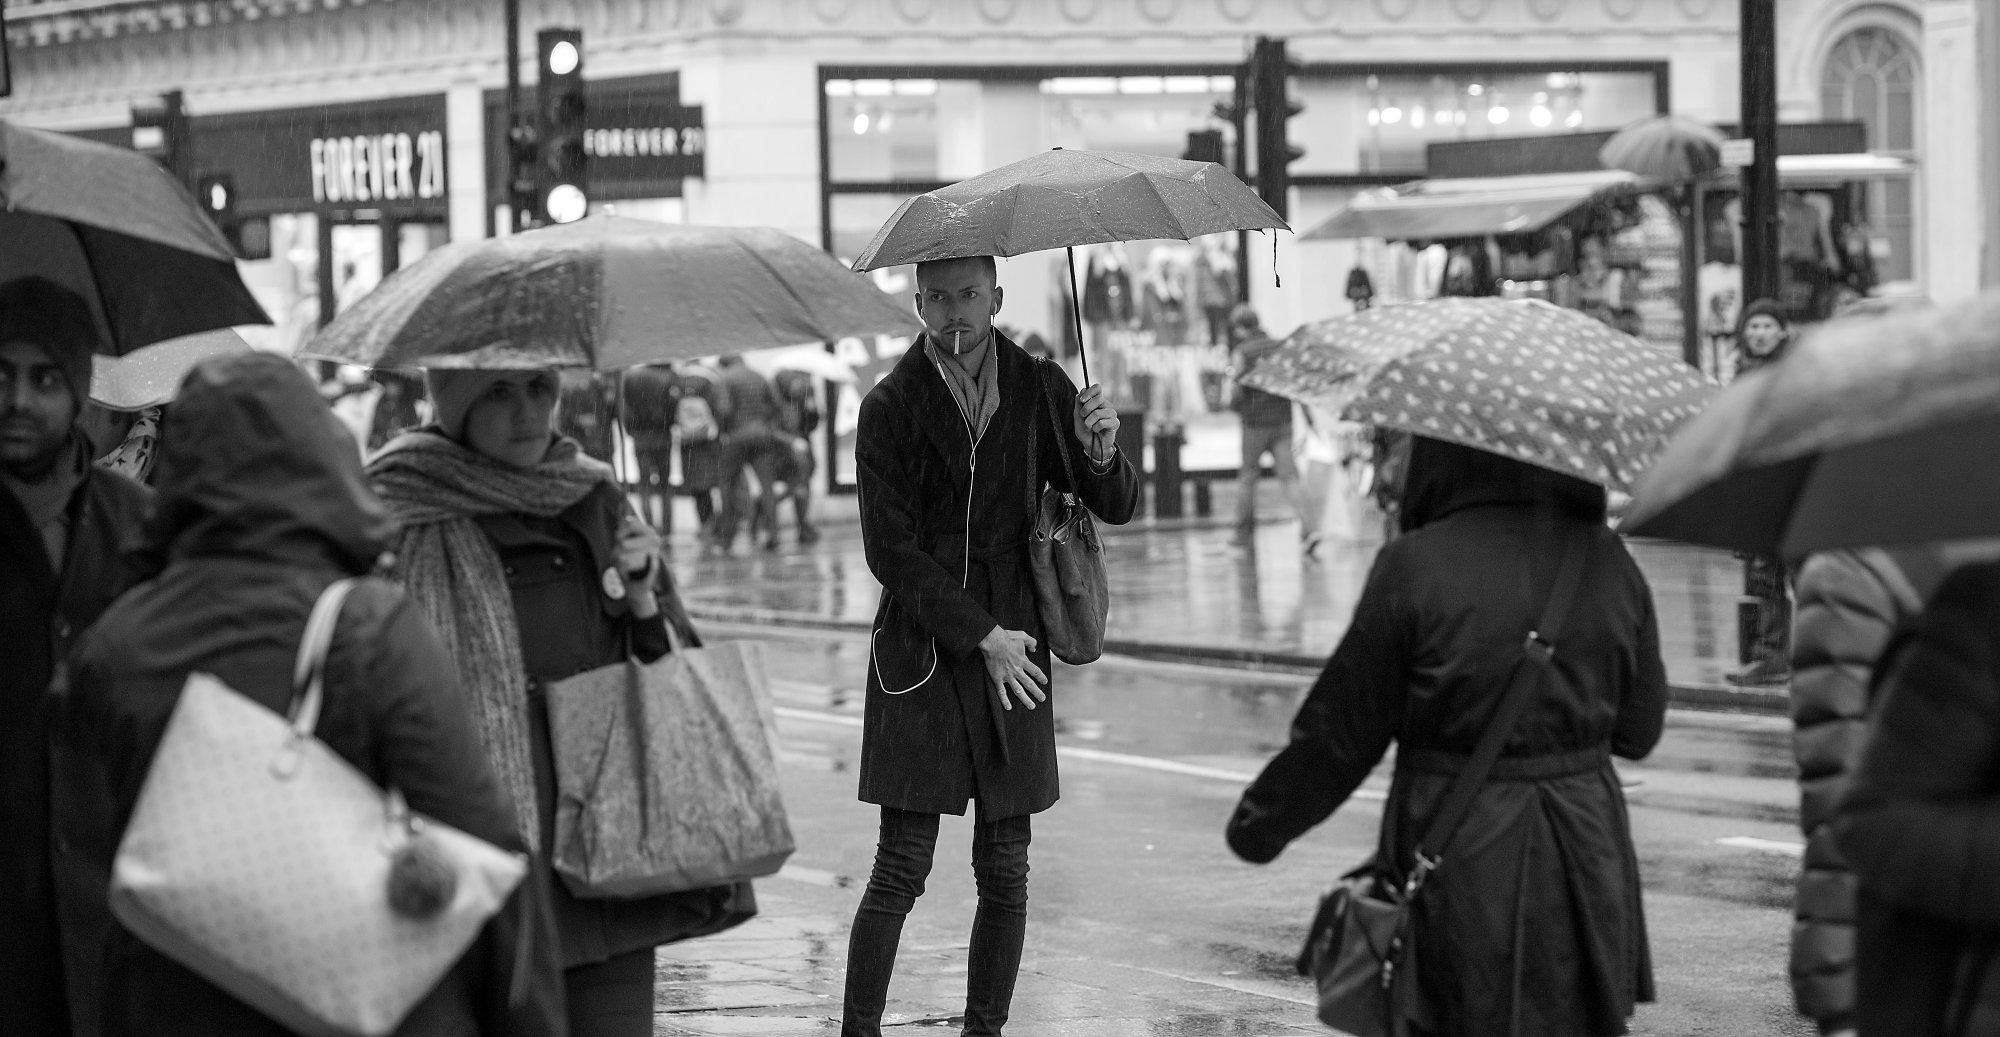 Rain - 5